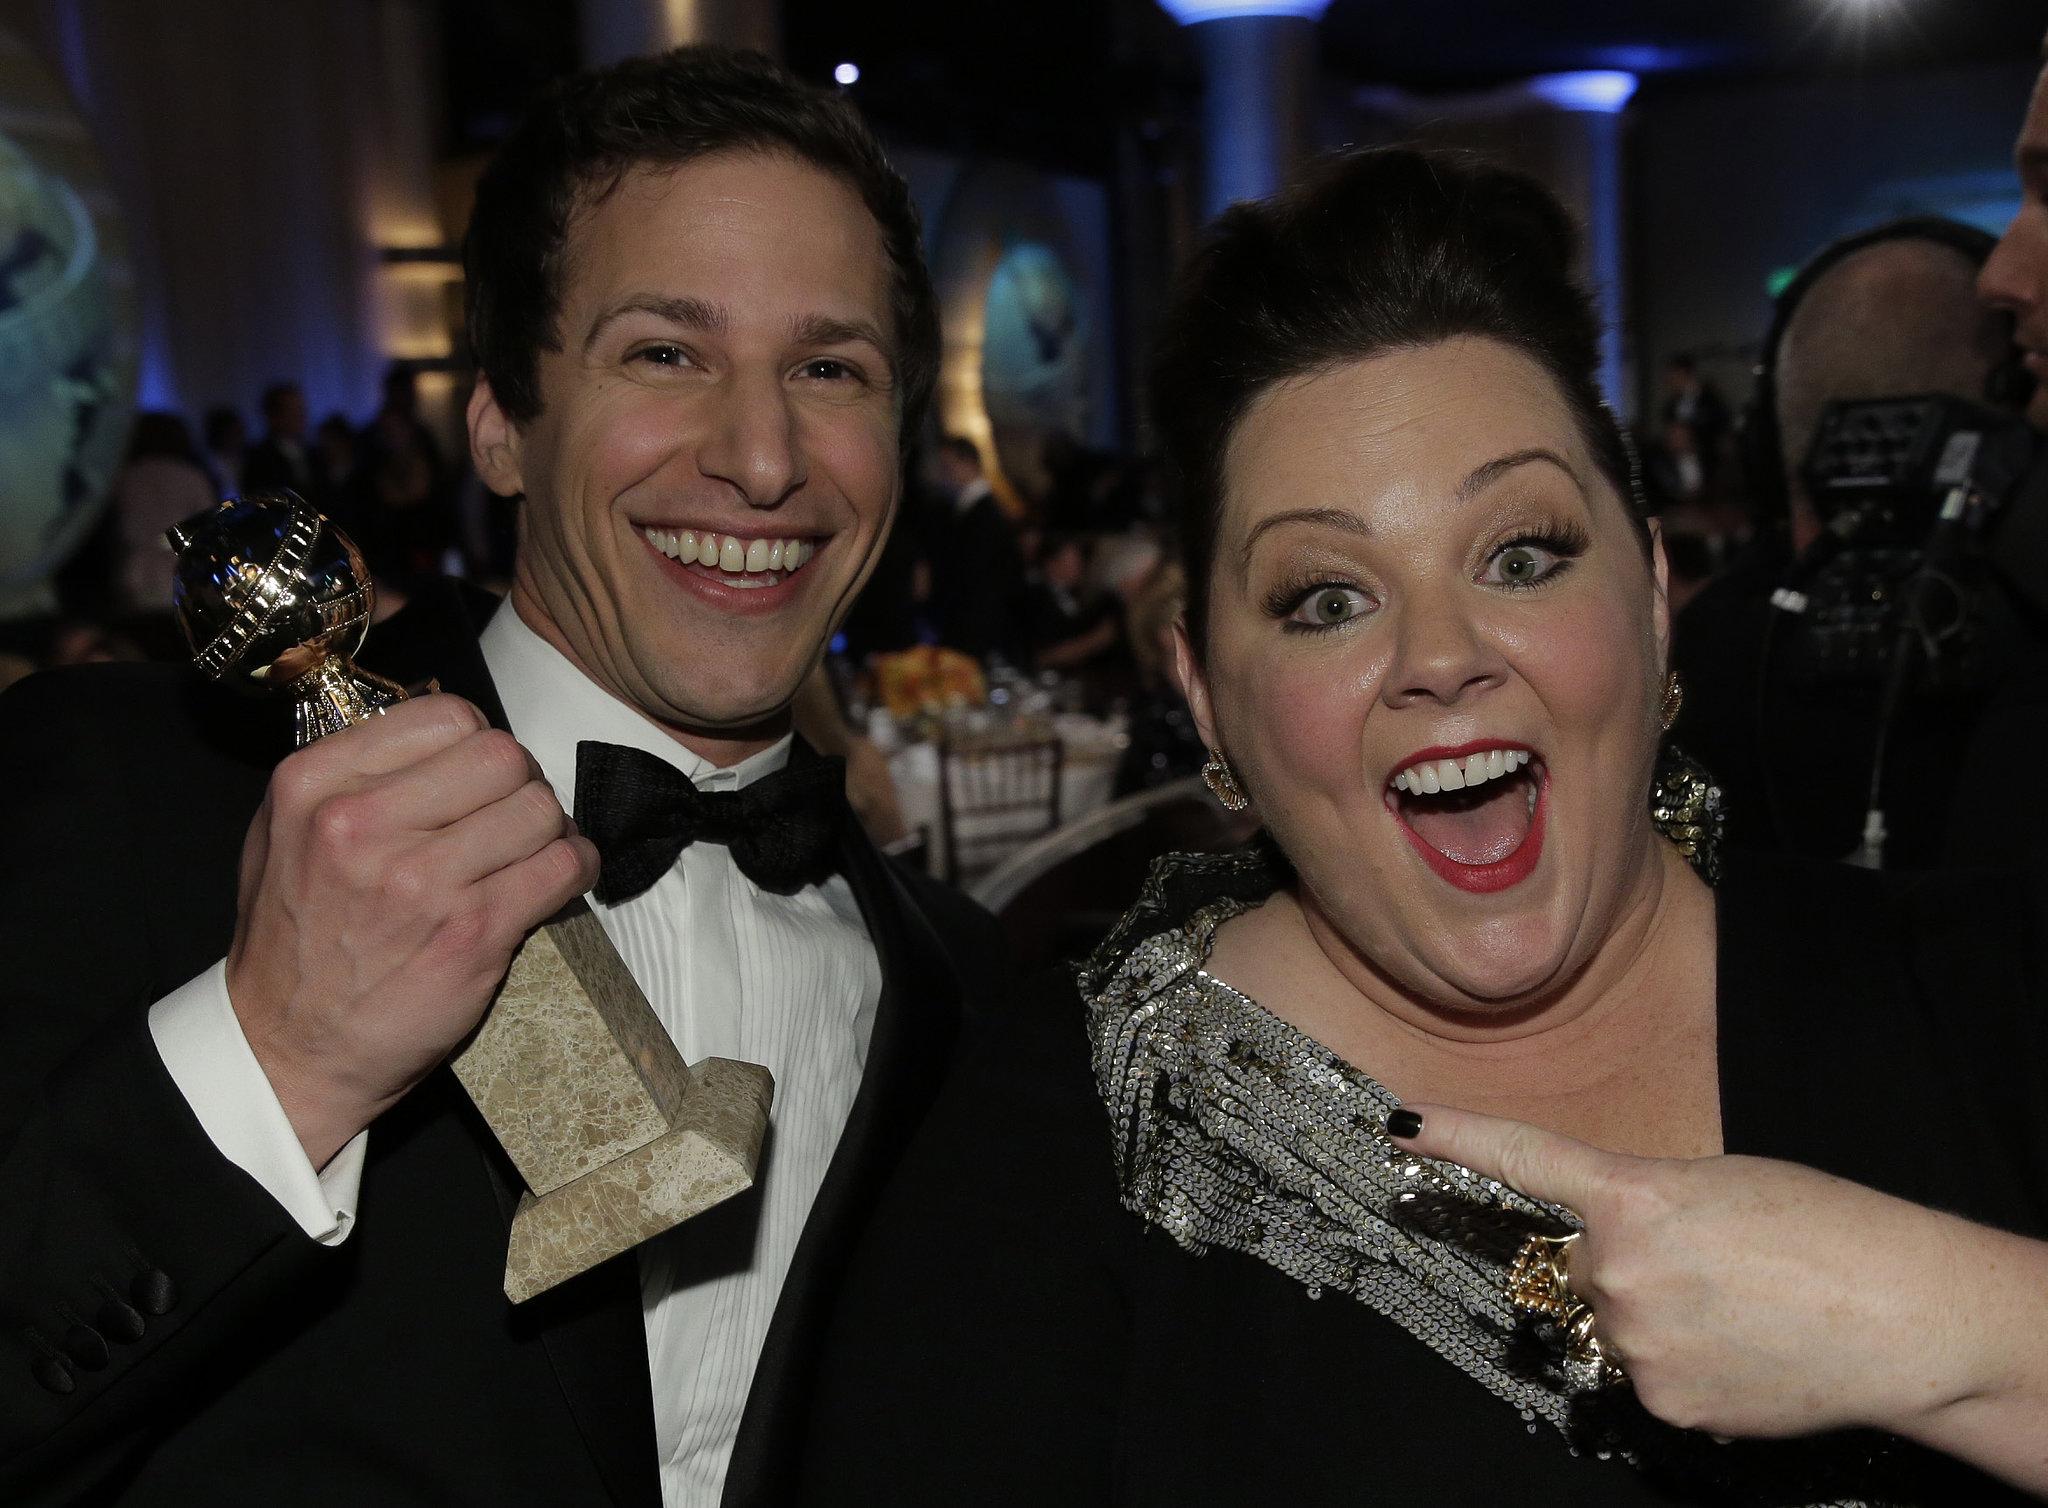 Andy Samberg and Melissa McCarthy